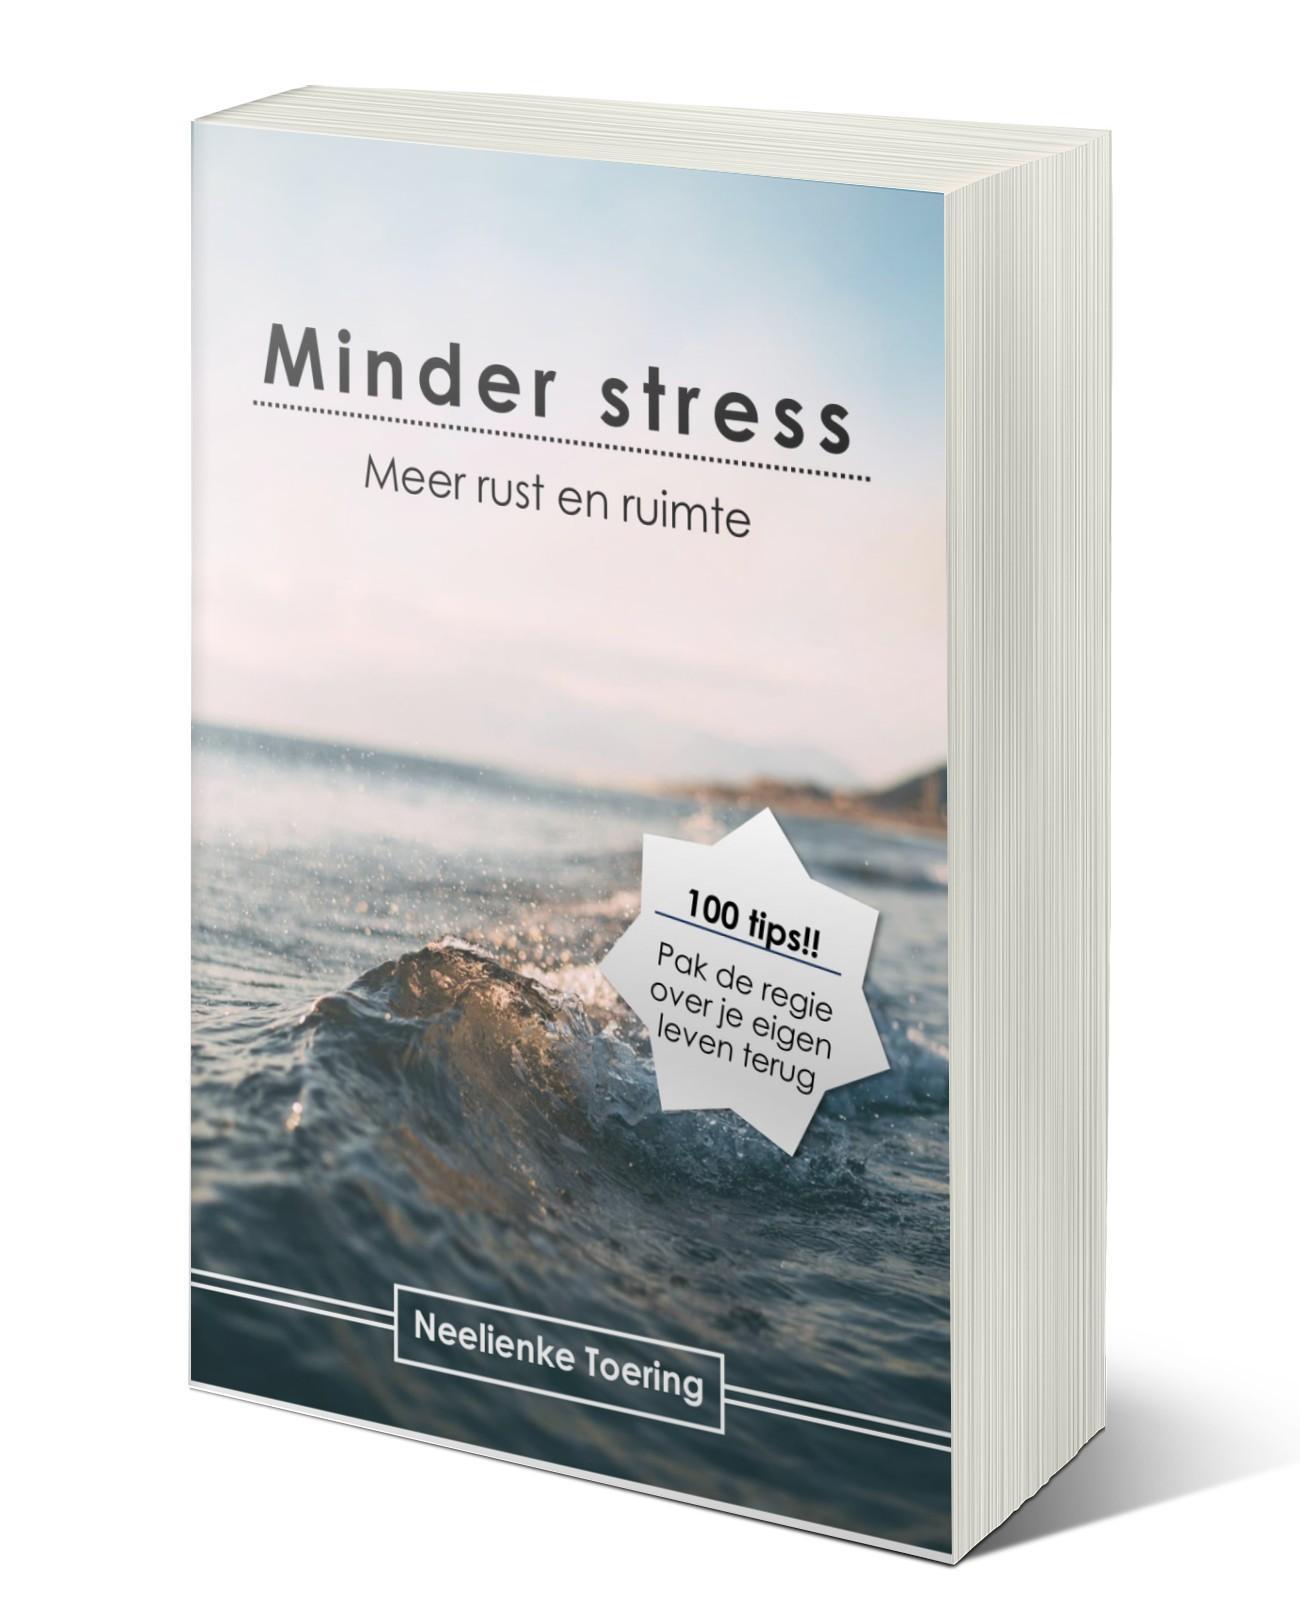 3d minder stress 100 tips